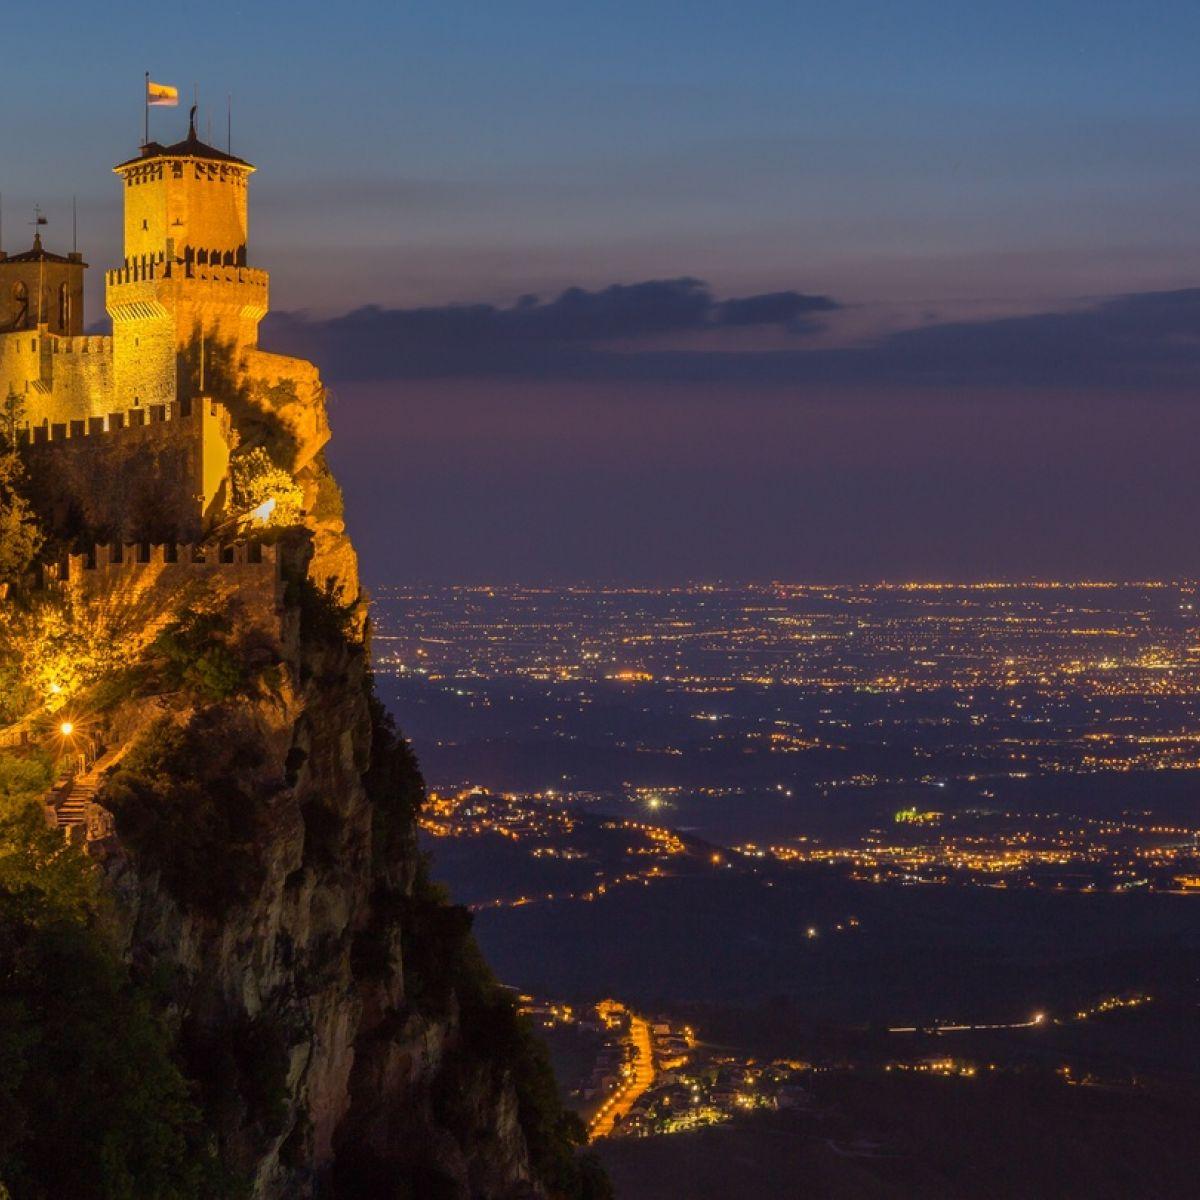 100 Adult Dating Free Site San Marino - Inverse Universe